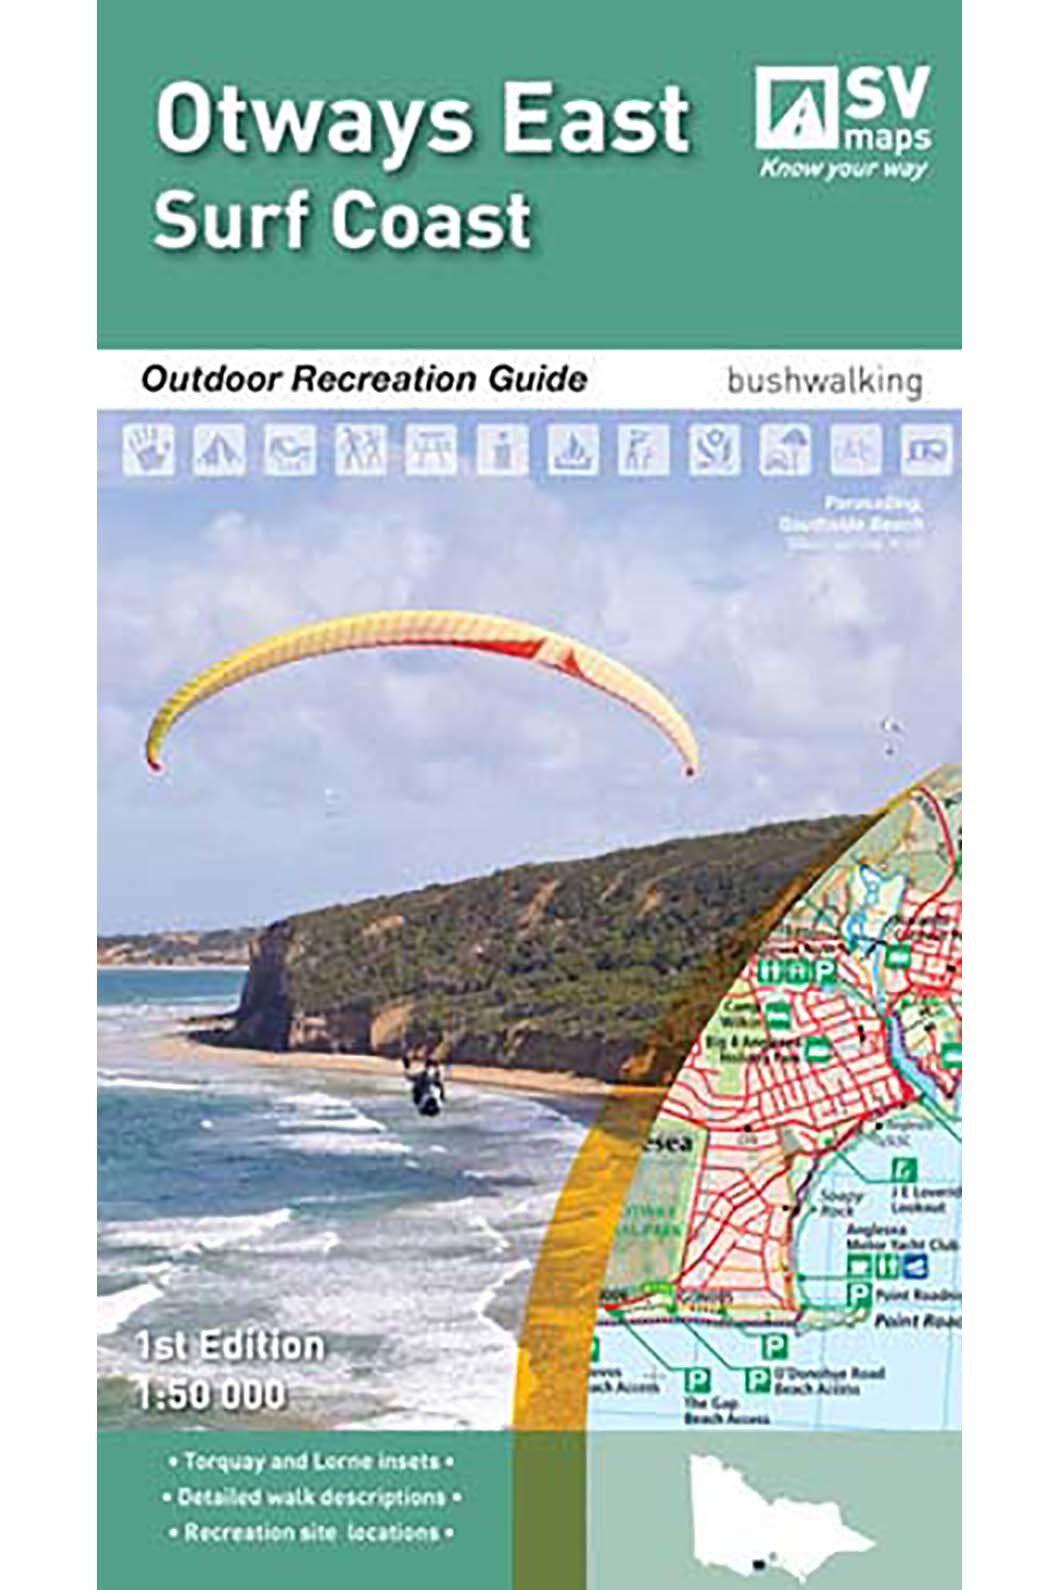 Hema Otways East Surfcoast Map, None, hi-res